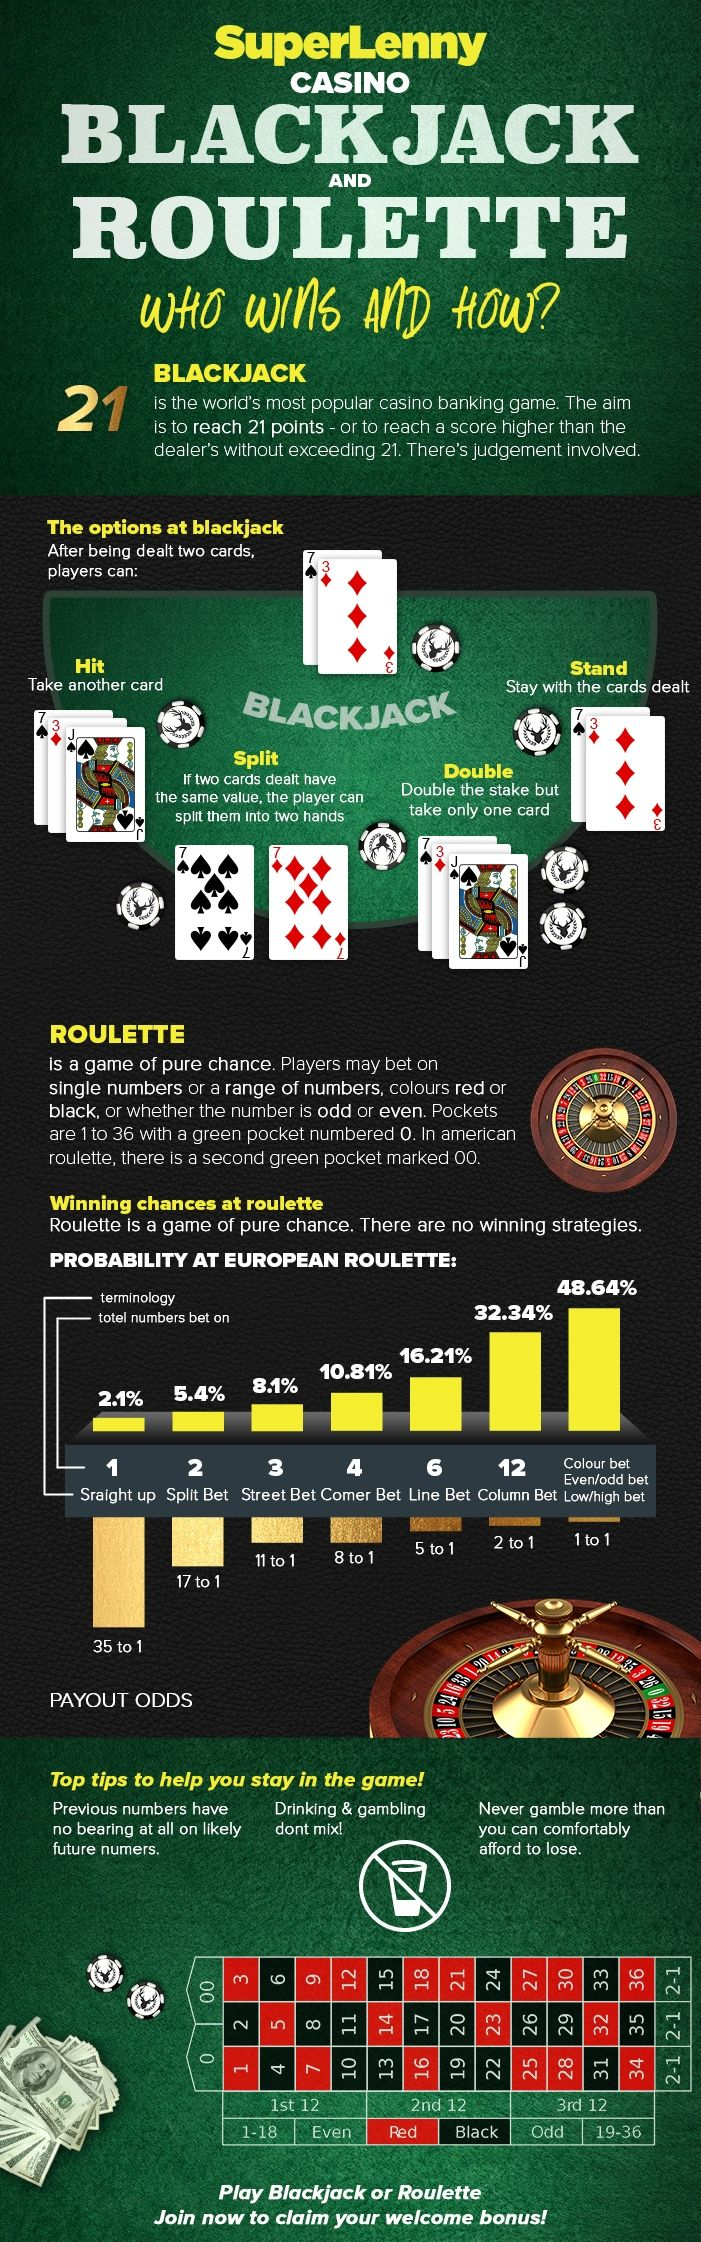 Roulette pot heupink